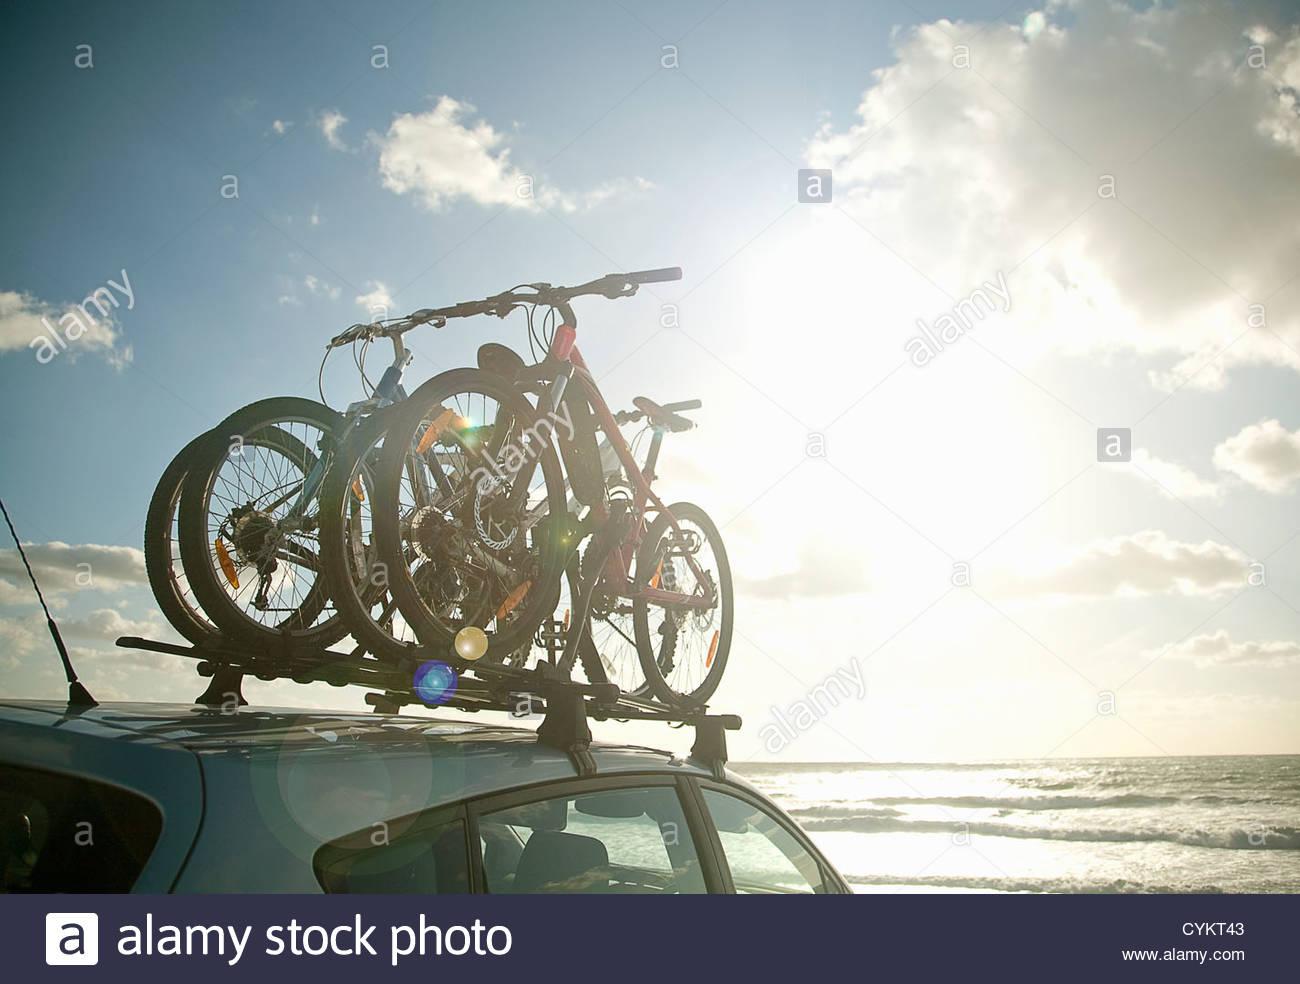 Fahrräder, Dach des Autos befestigt Stockbild